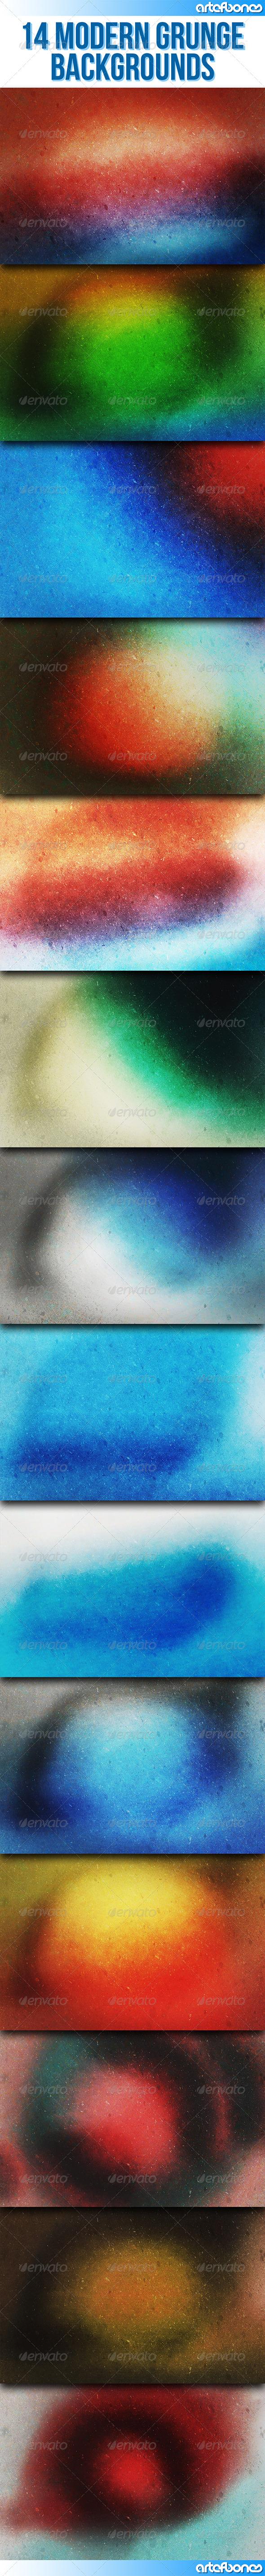 GraphicRiver 14 Modern Grunge Backgrounds 8140051